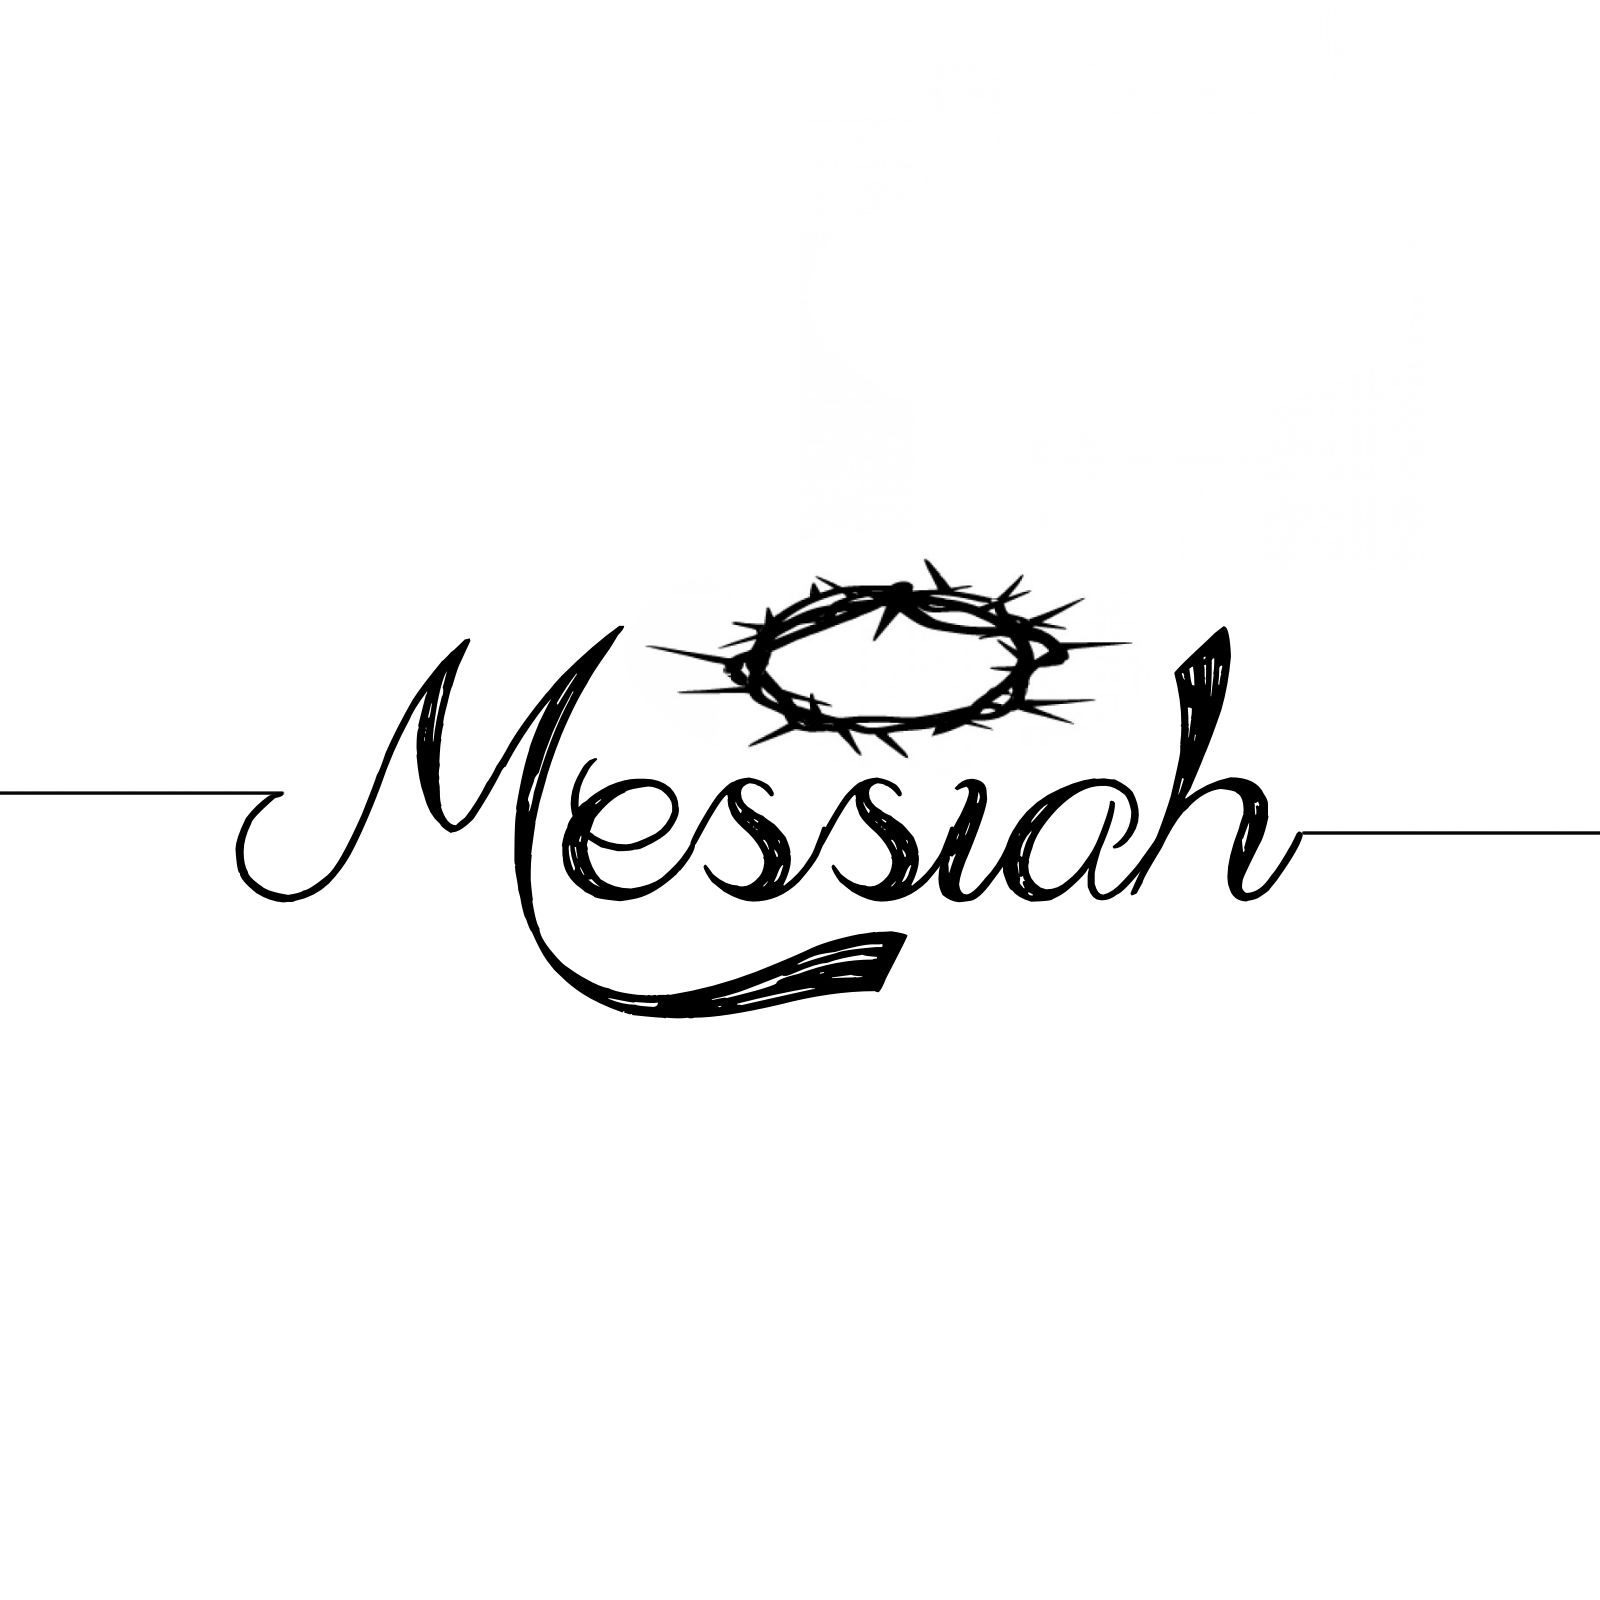 12.21.14 Amazing Messiah: The Present of Presence